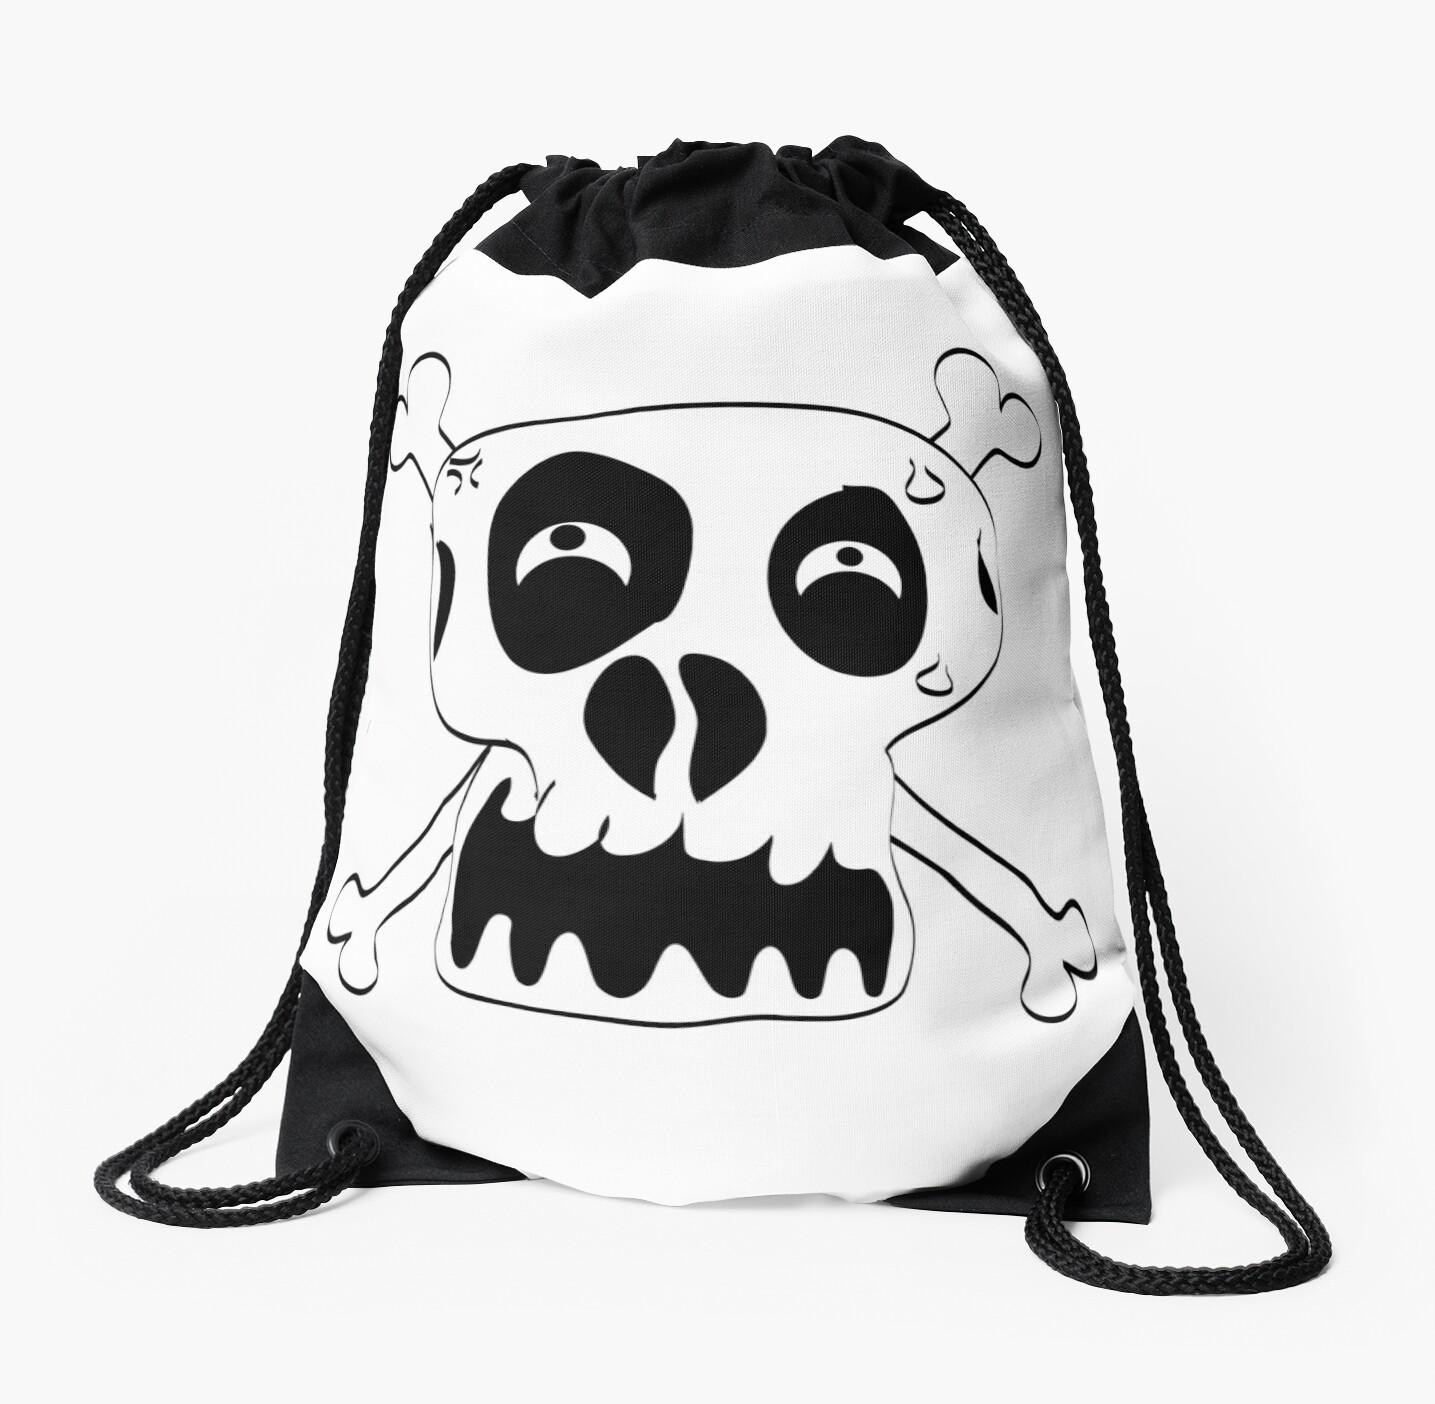 Cartoon Skull and Cross Bones by Chillee Wilson by ChilleeWilson